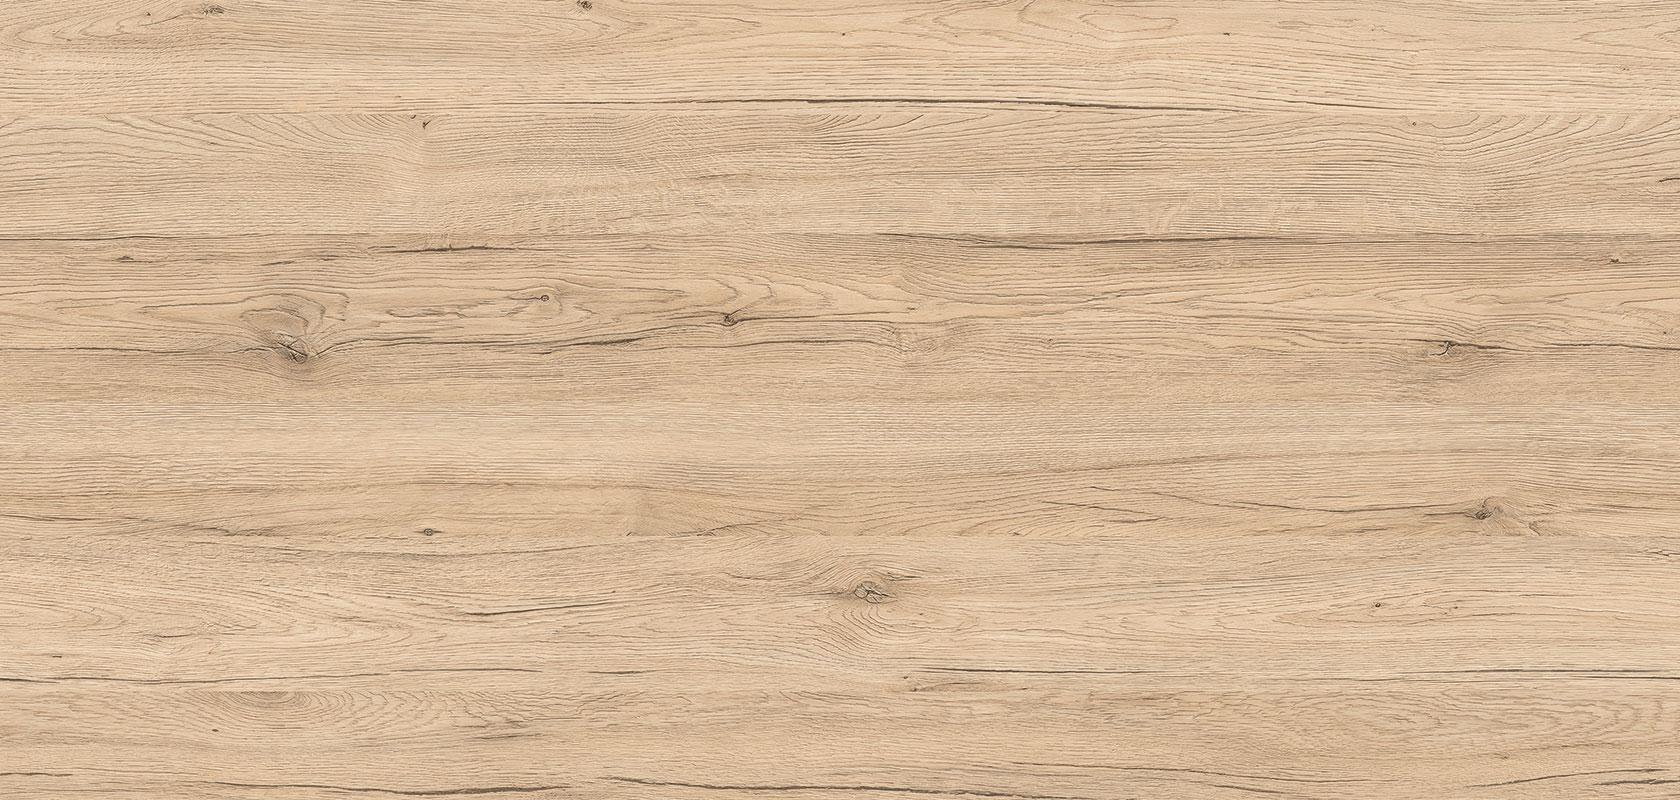 078 Sanremo oak reproduction